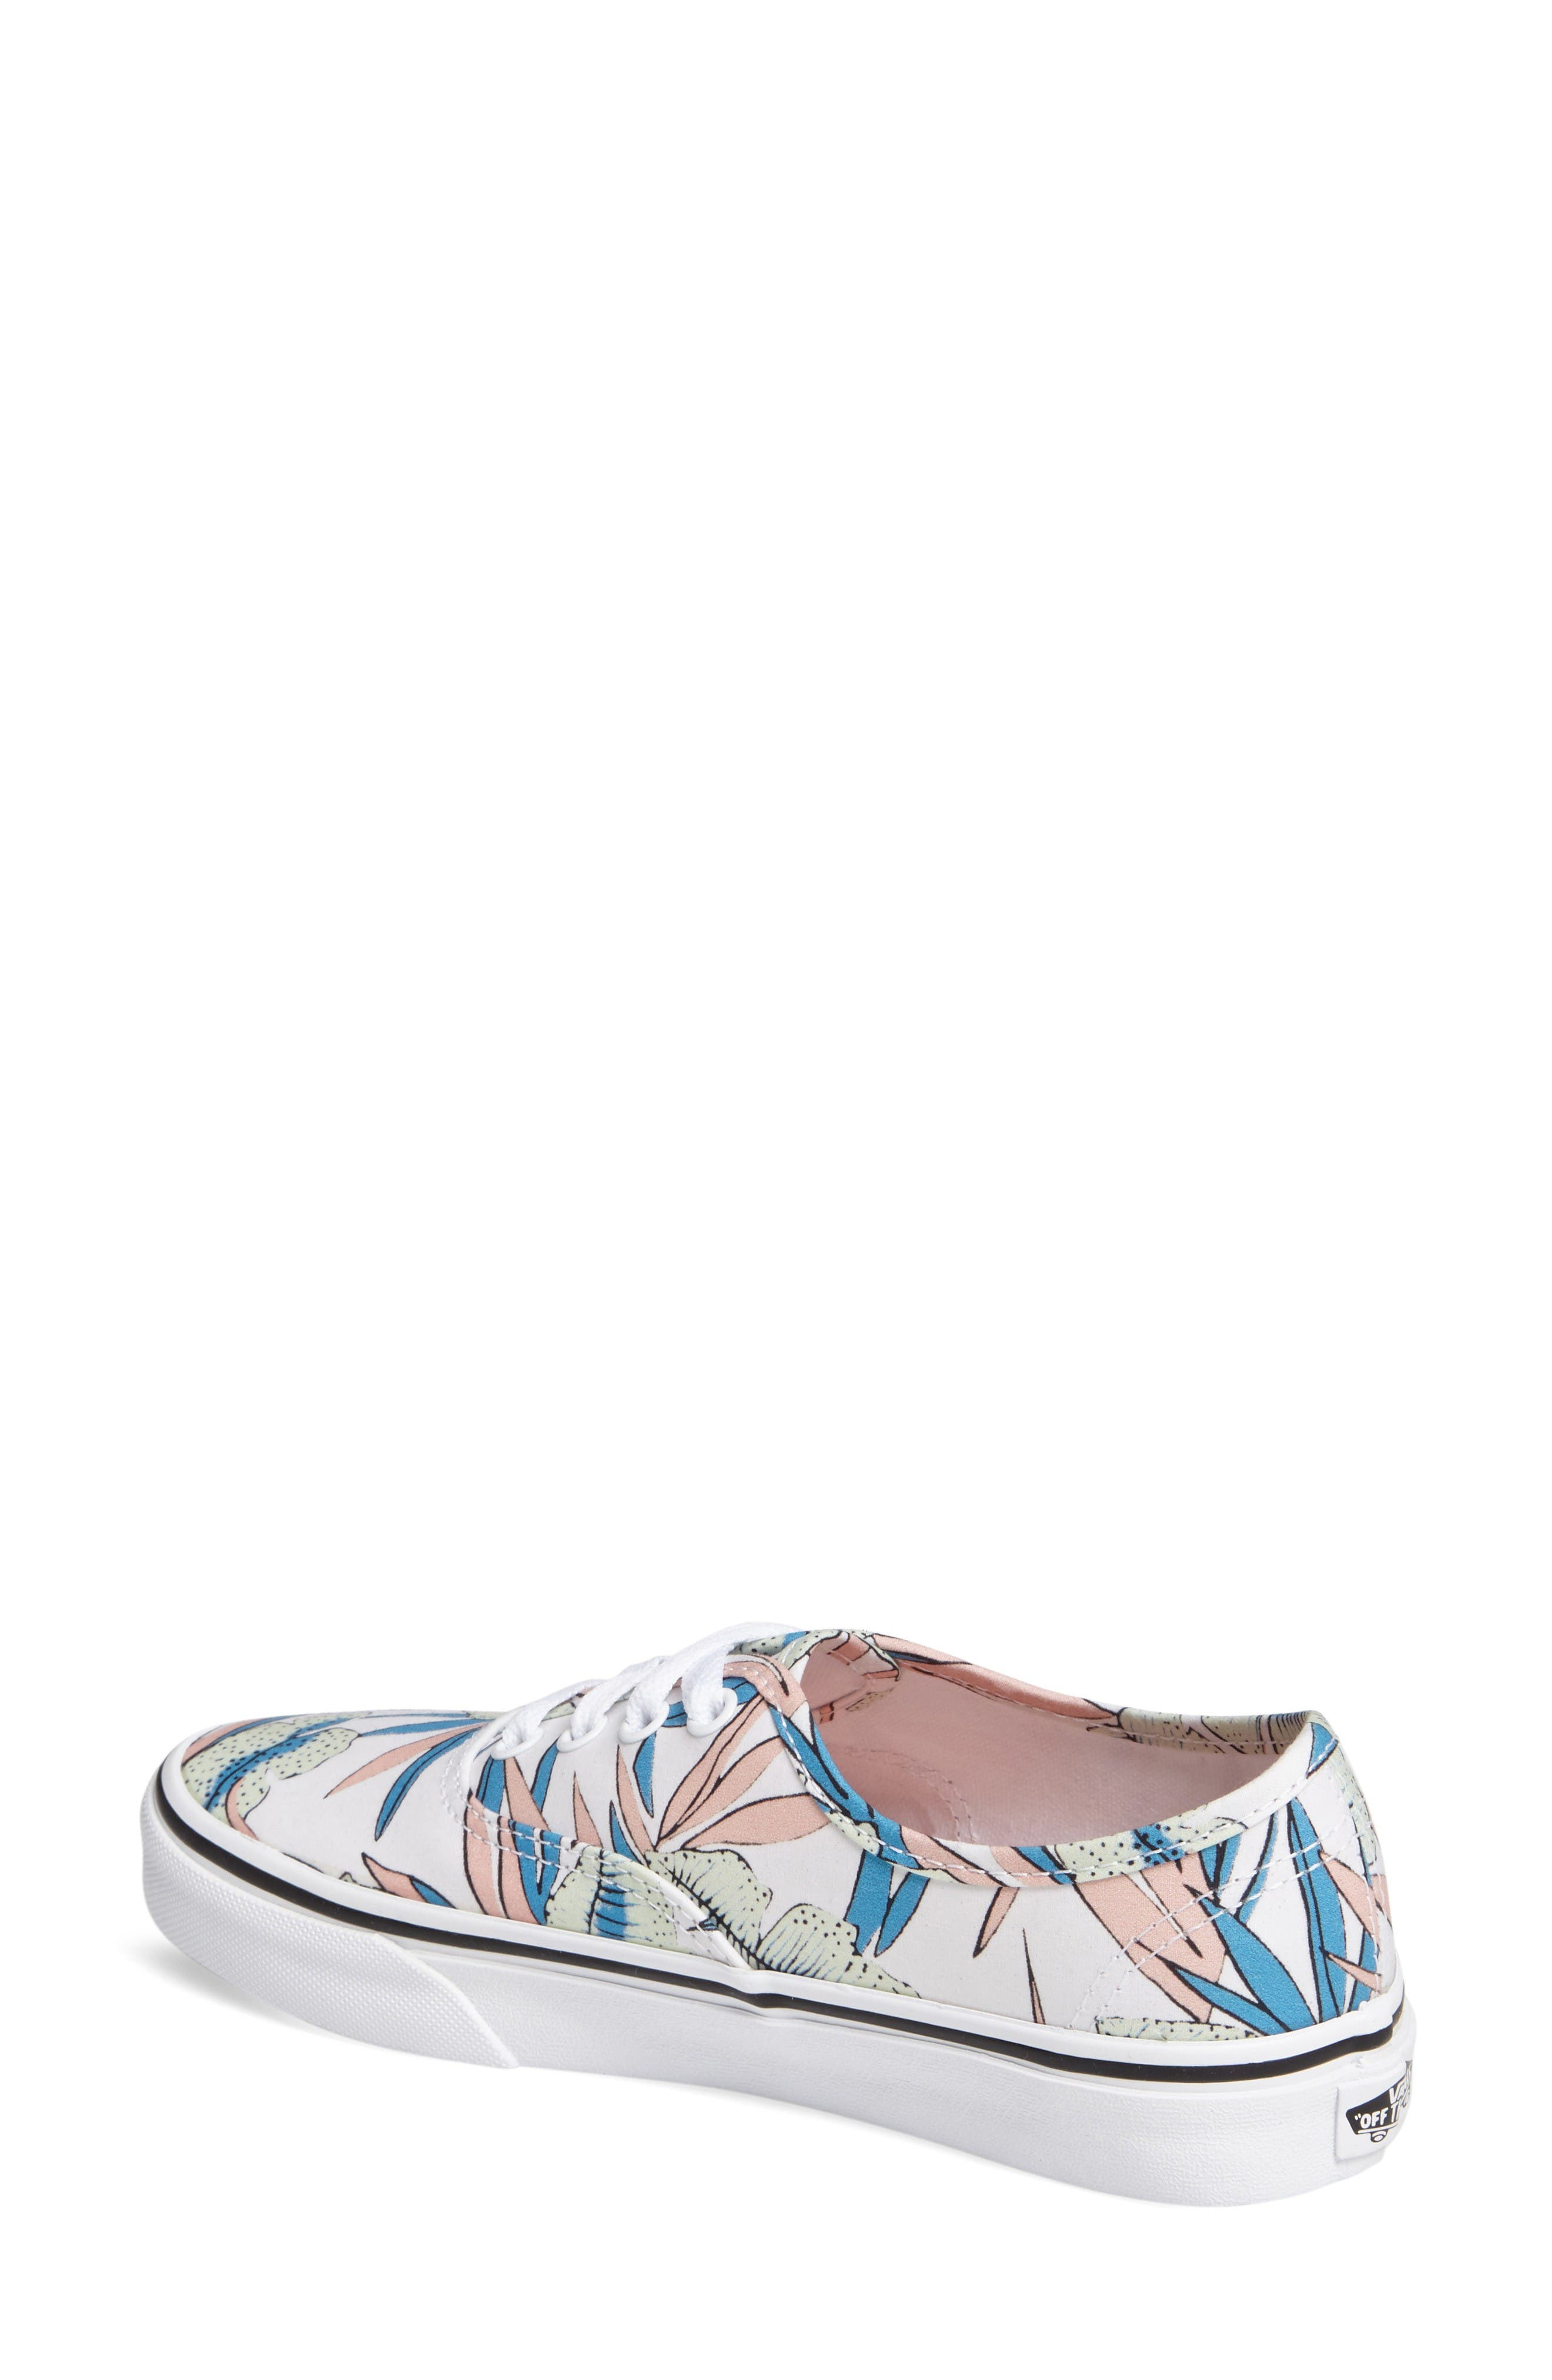 Alternate Image 2  - Vans 'Authentic' Canvas Sneaker (Women)